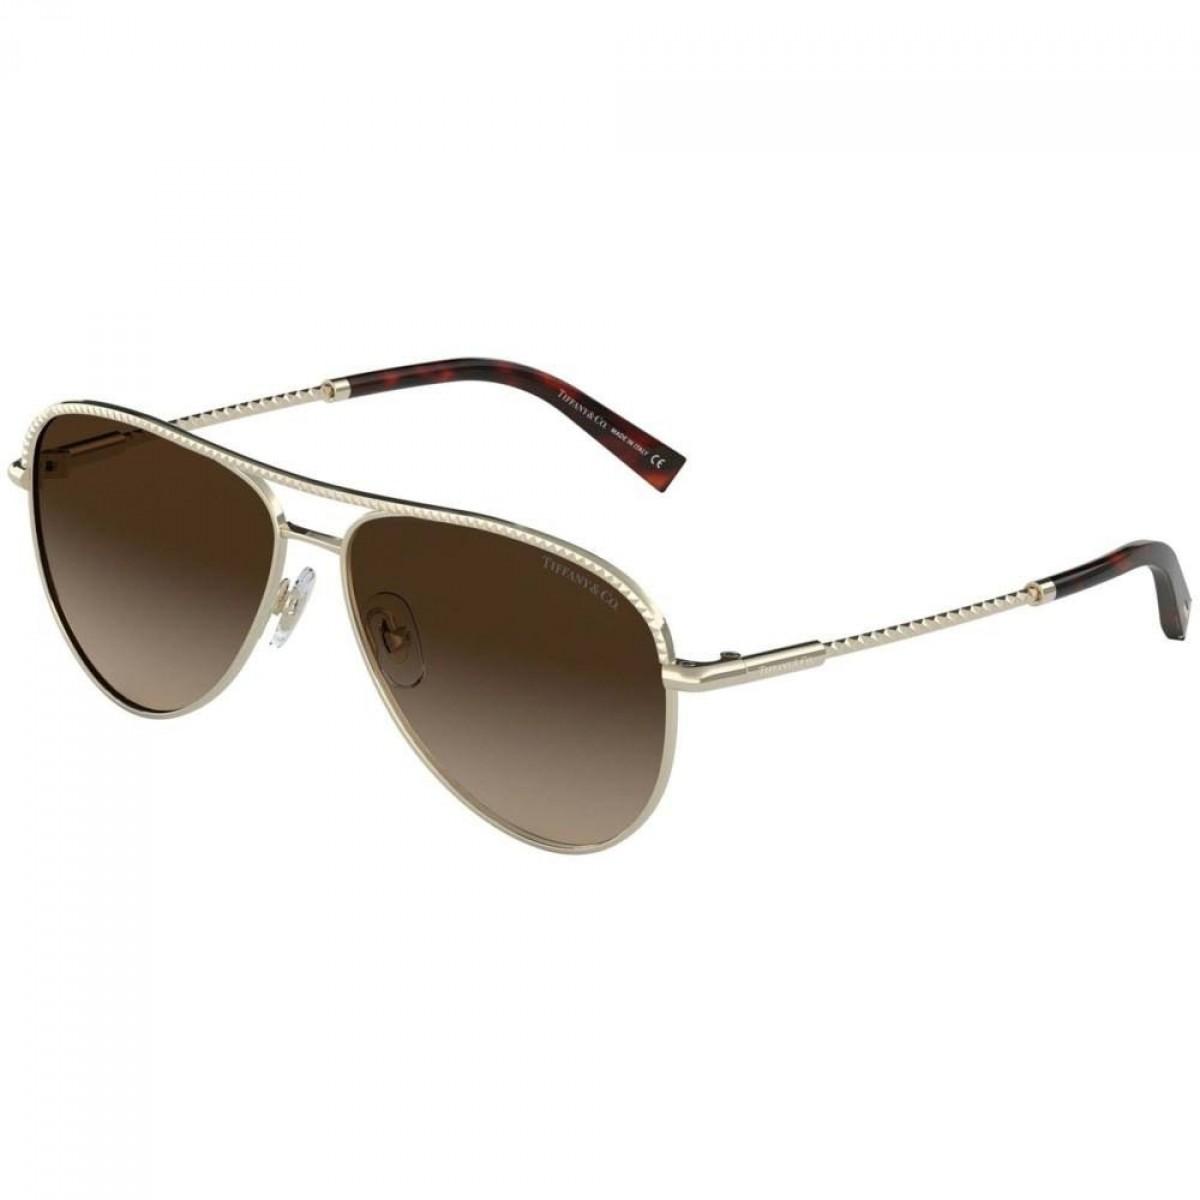 Tiffany & Co. 3062 60213B 57, 164,99€, Occhiali Tiffany & Co. Oro a forma Goccia aviator